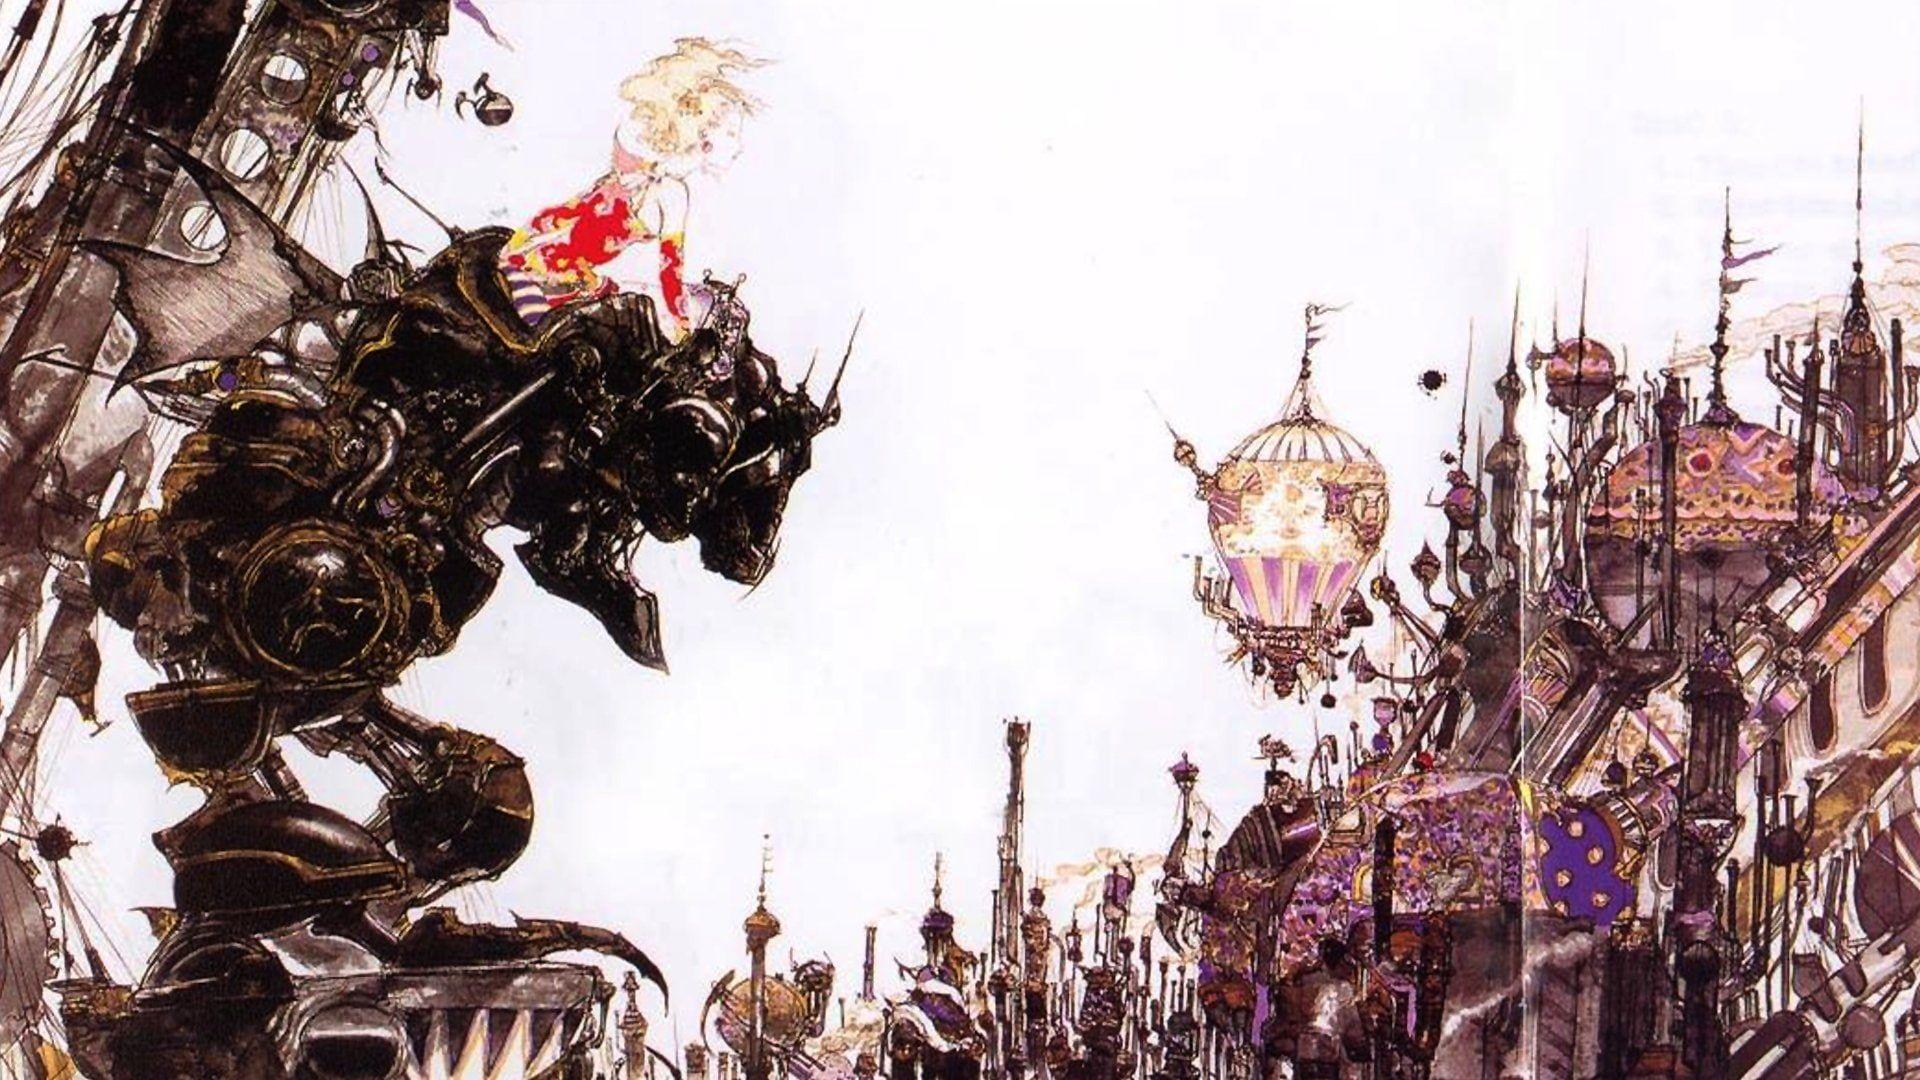 Final Fantasy Final Fantasy Vi 1080p Wallpaper Hdwallpaper Desktop In 2021 Final Fantasy Vi Hd Wallpaper Final Fantasy